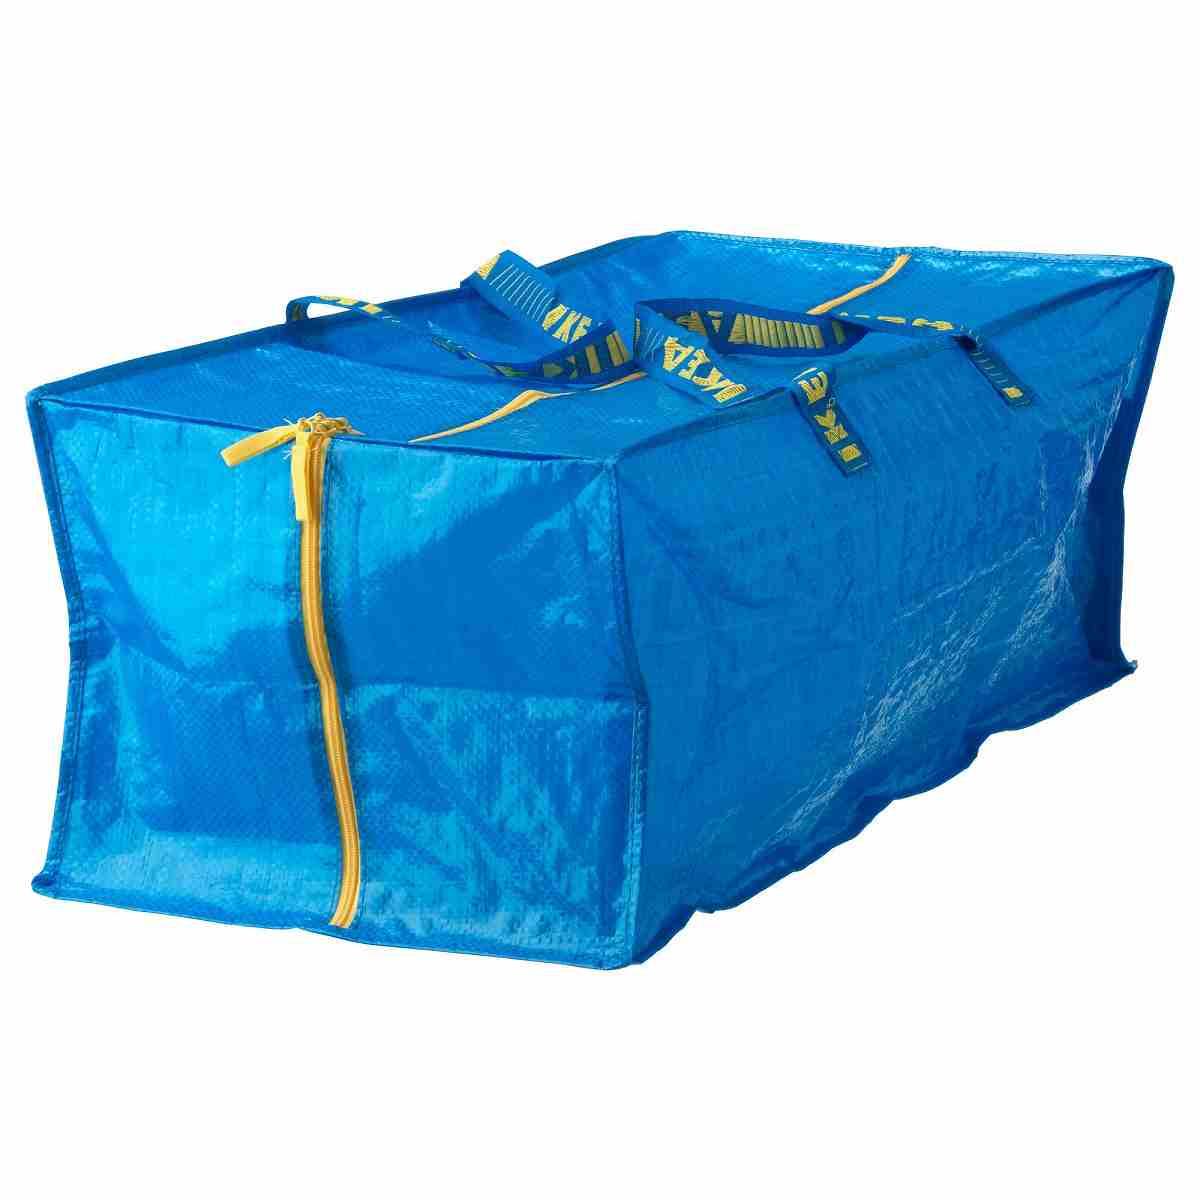 IKEA(イケア) FRAKTA トロリー用バッグ ブルー a90161989